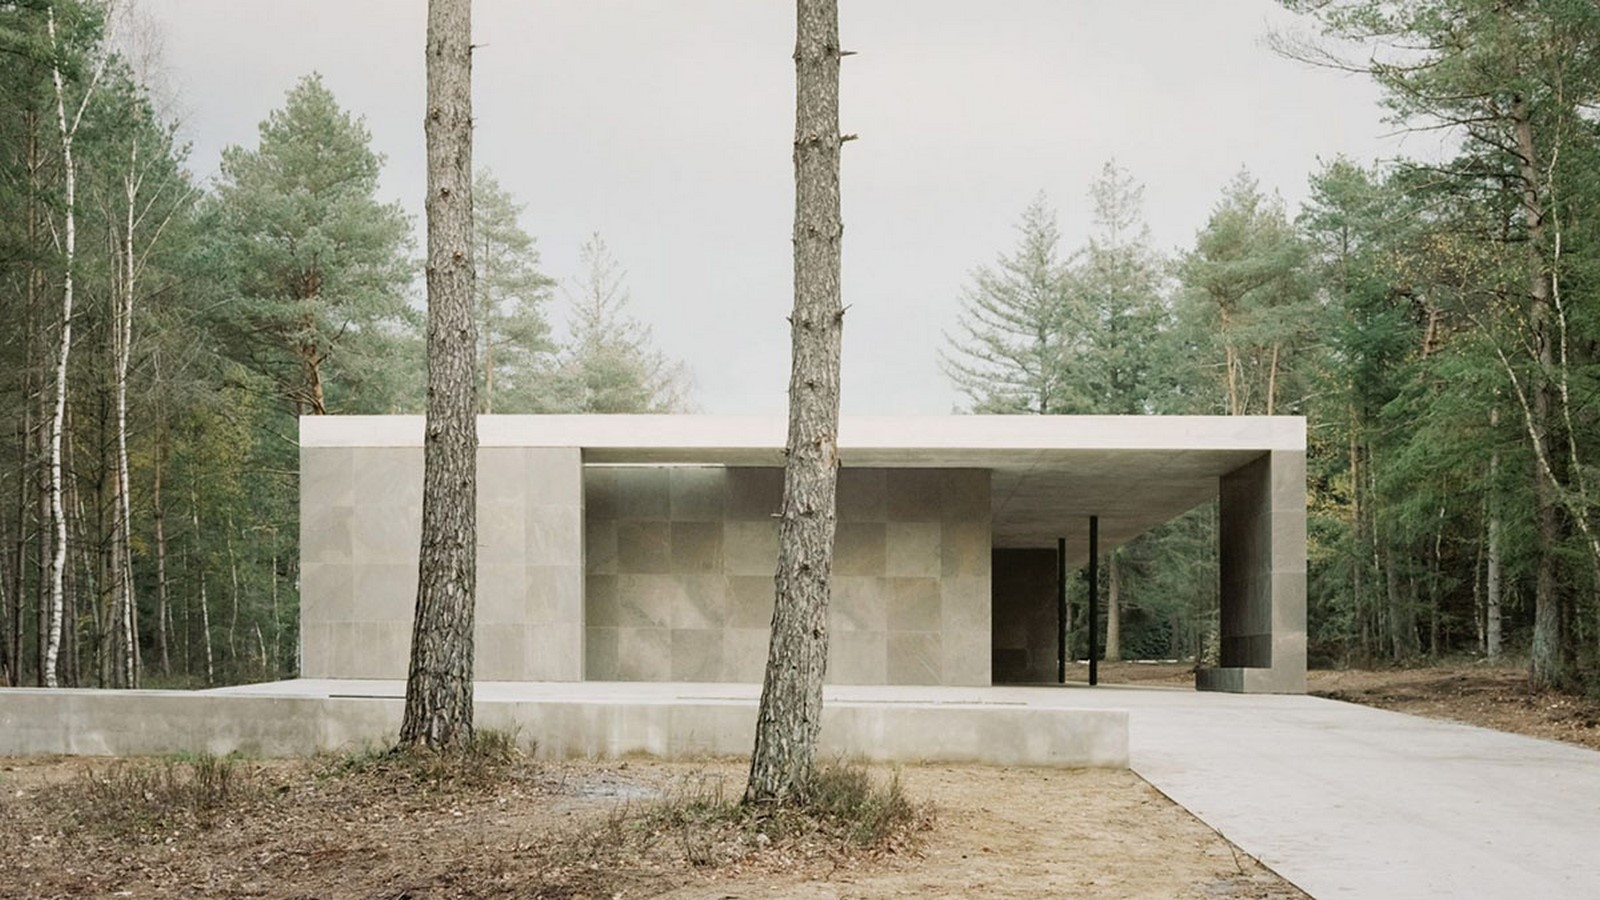 Serene Loenen Pavilion Commemorating Dutch Victims Among Pine Trees built by KAAN Architecten - Sheet1